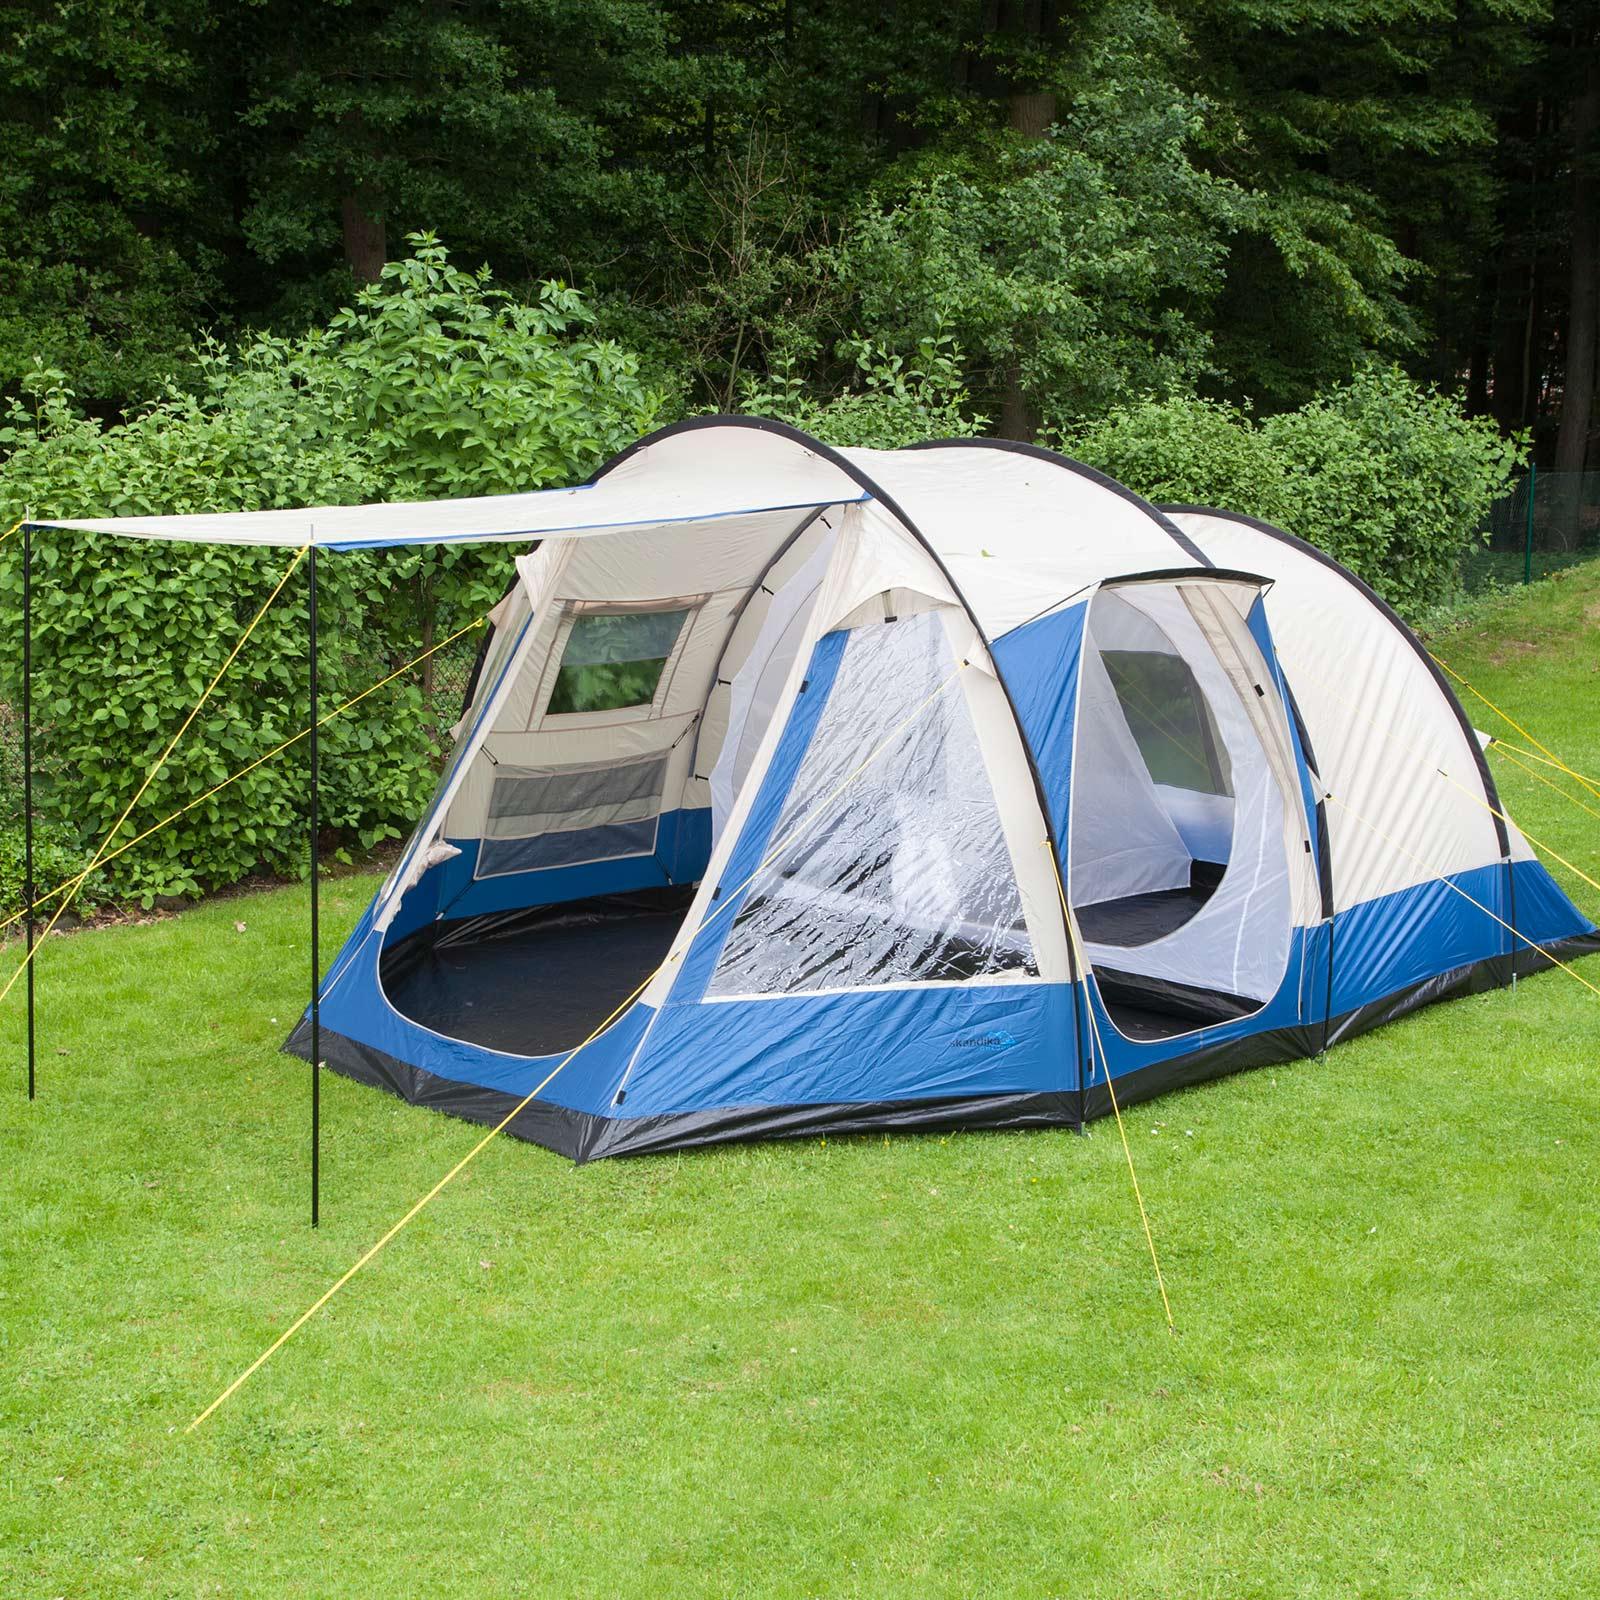 Zelt 5 Personen : Skandika lyon personen familienzelt camping zelt neu ebay